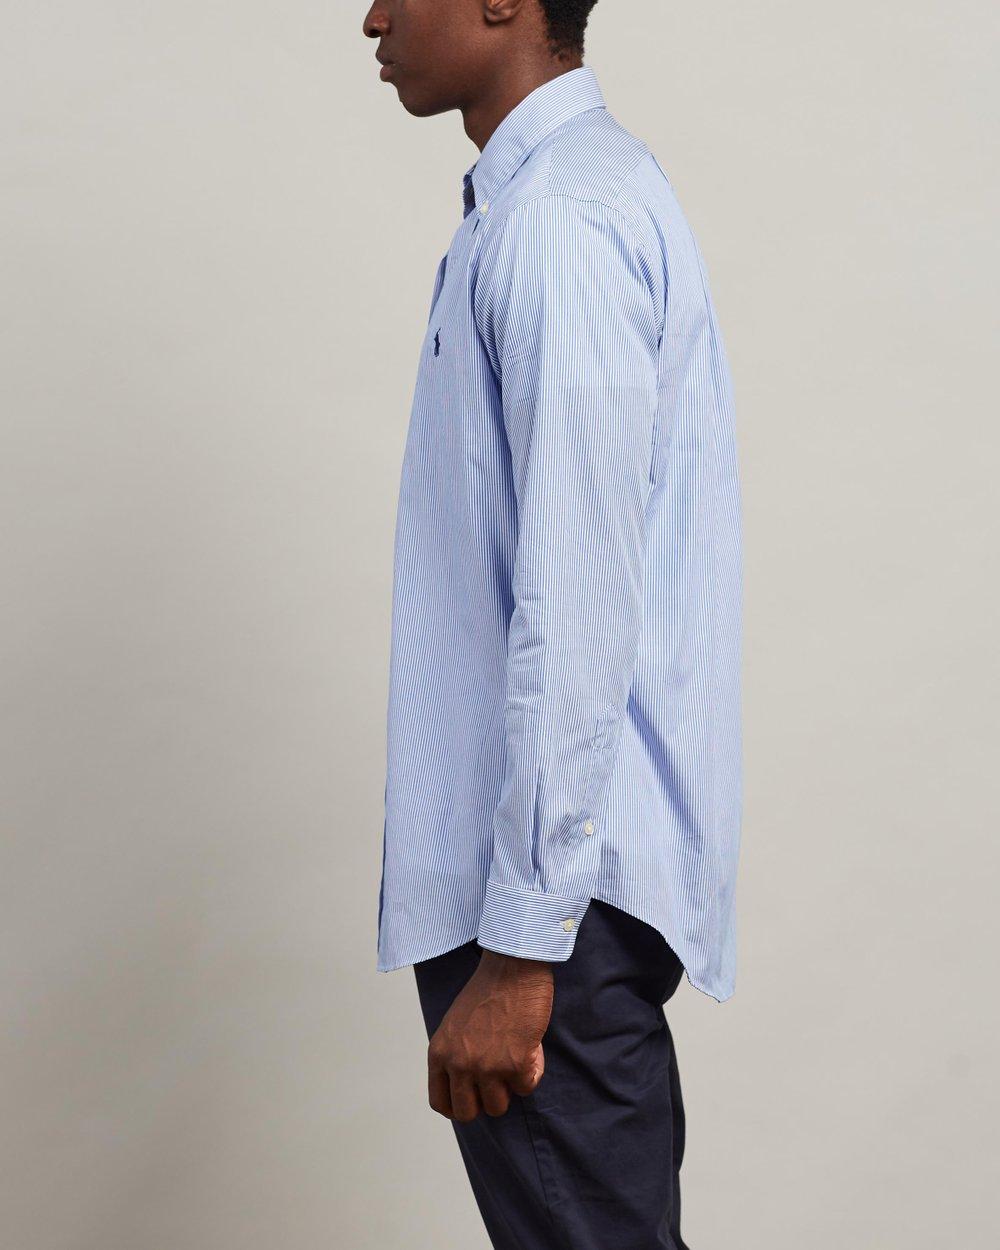 ad29bc42d4ad Striped Cotton Poplin Shirt by Polo Ralph Lauren Online